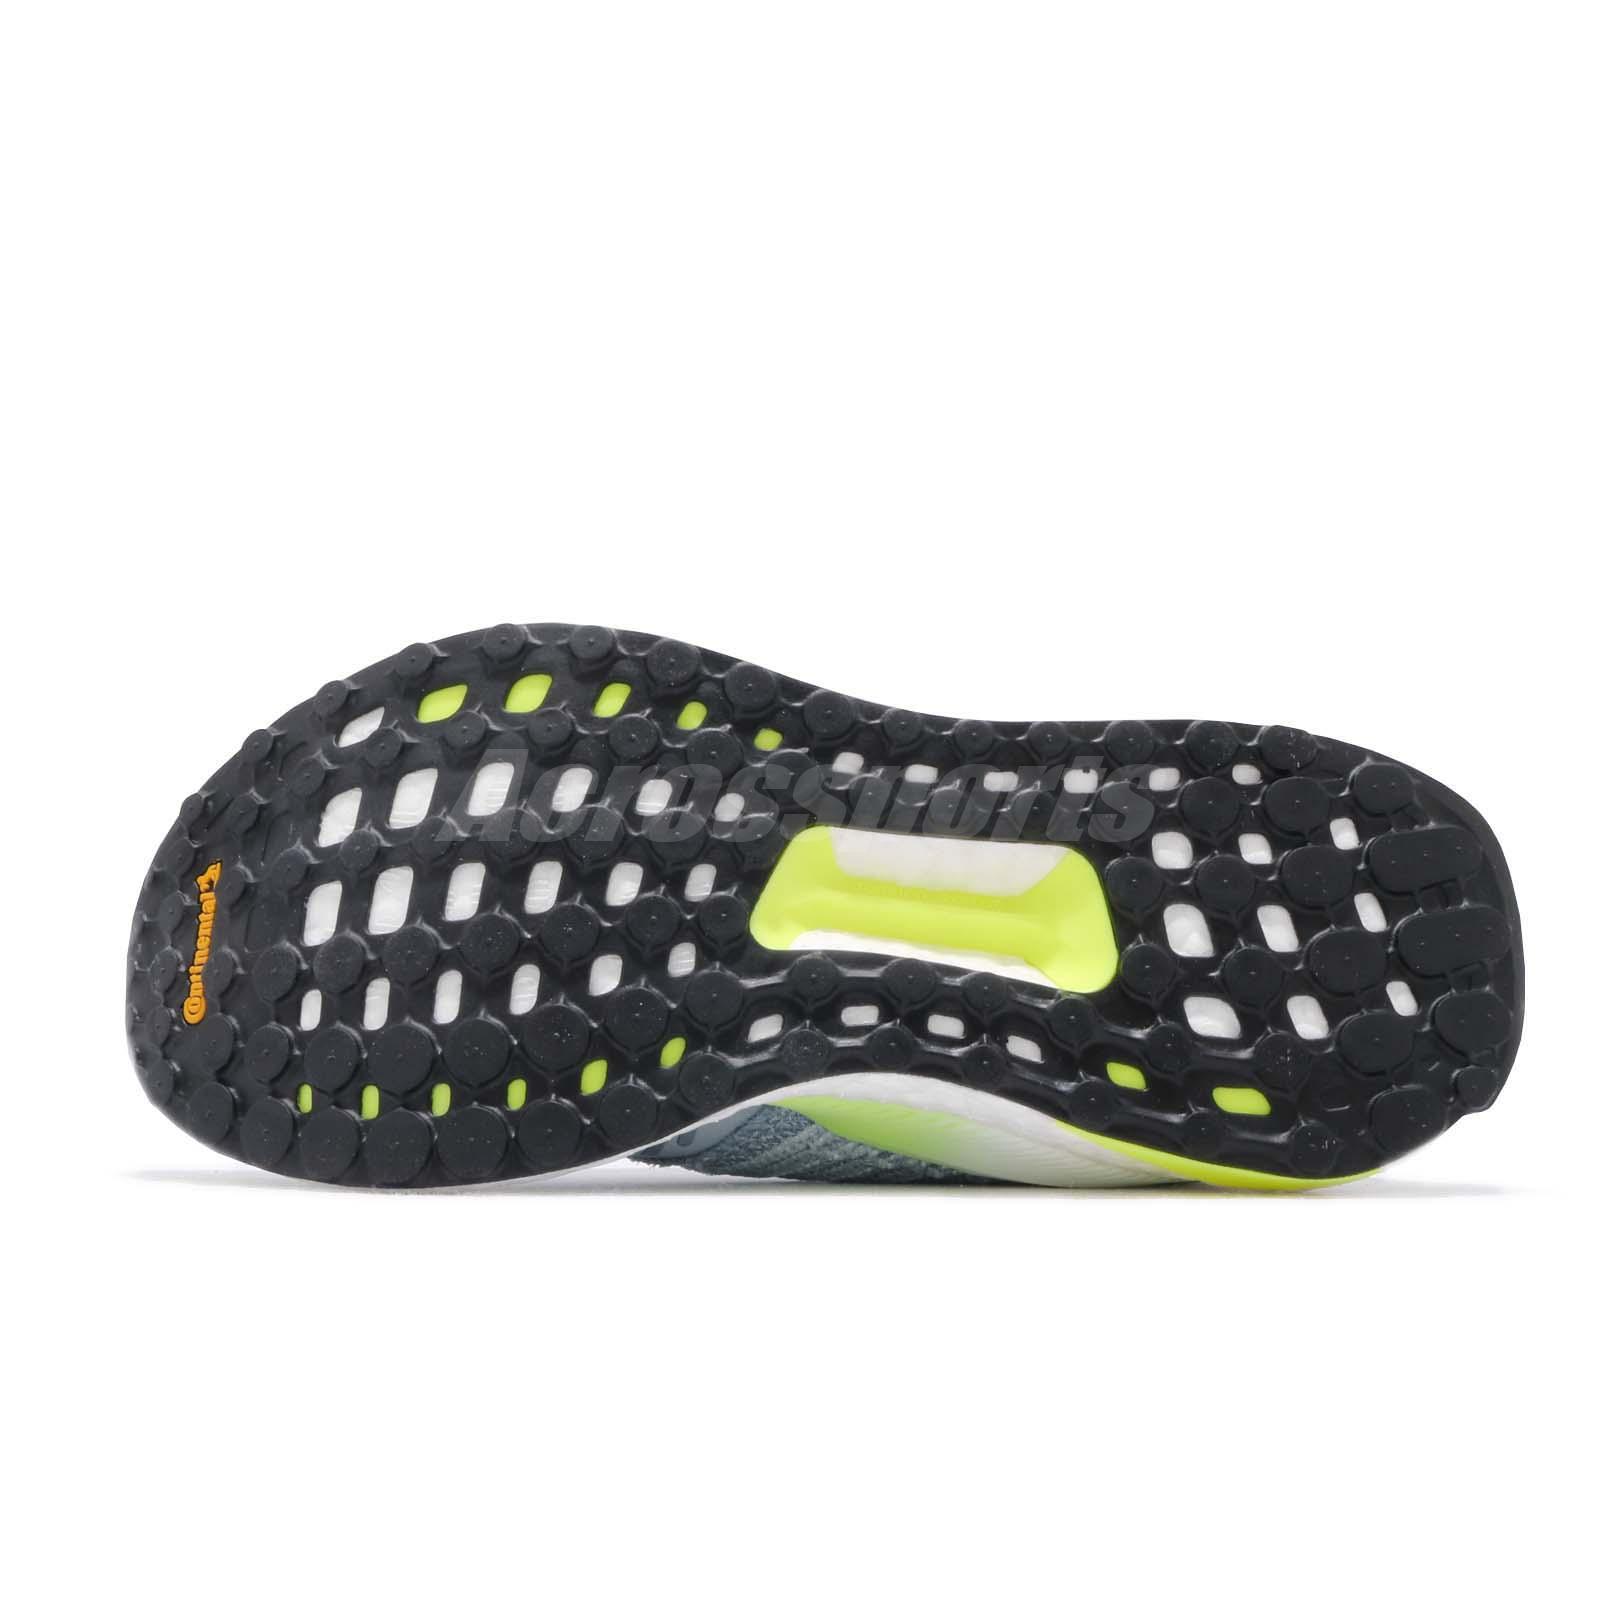 db005b7a55b0d adidas Solar BOOST W Grey Onix Blue Hi-Res Yellow Women Running ...